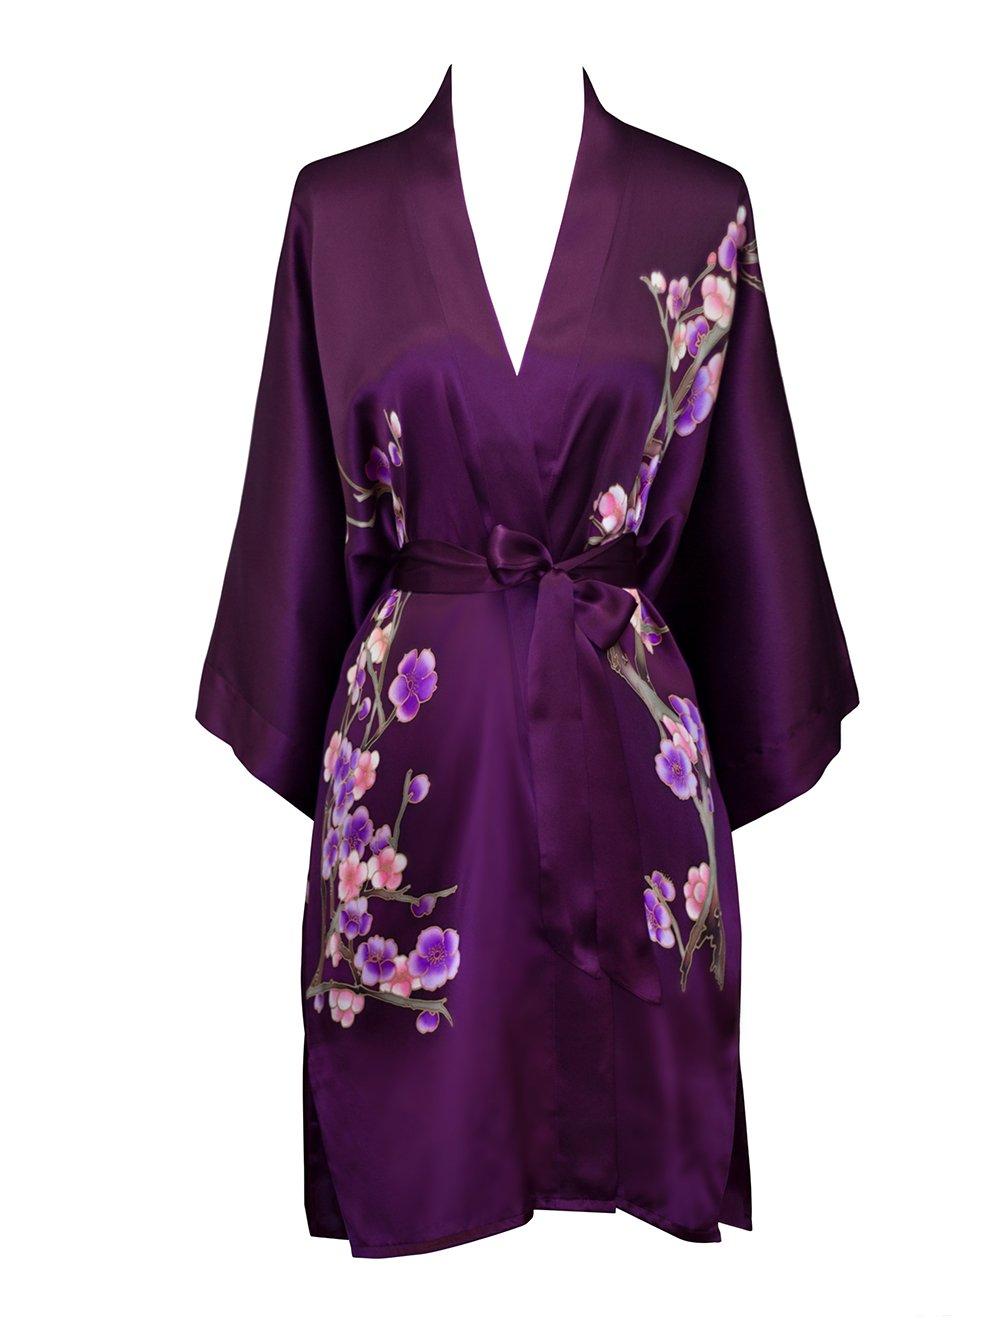 Old Shanghai Women's Silk Kimono Short Robe - Handpainted (Cherry Blossom Plum) by Old Shanghai (Image #1)